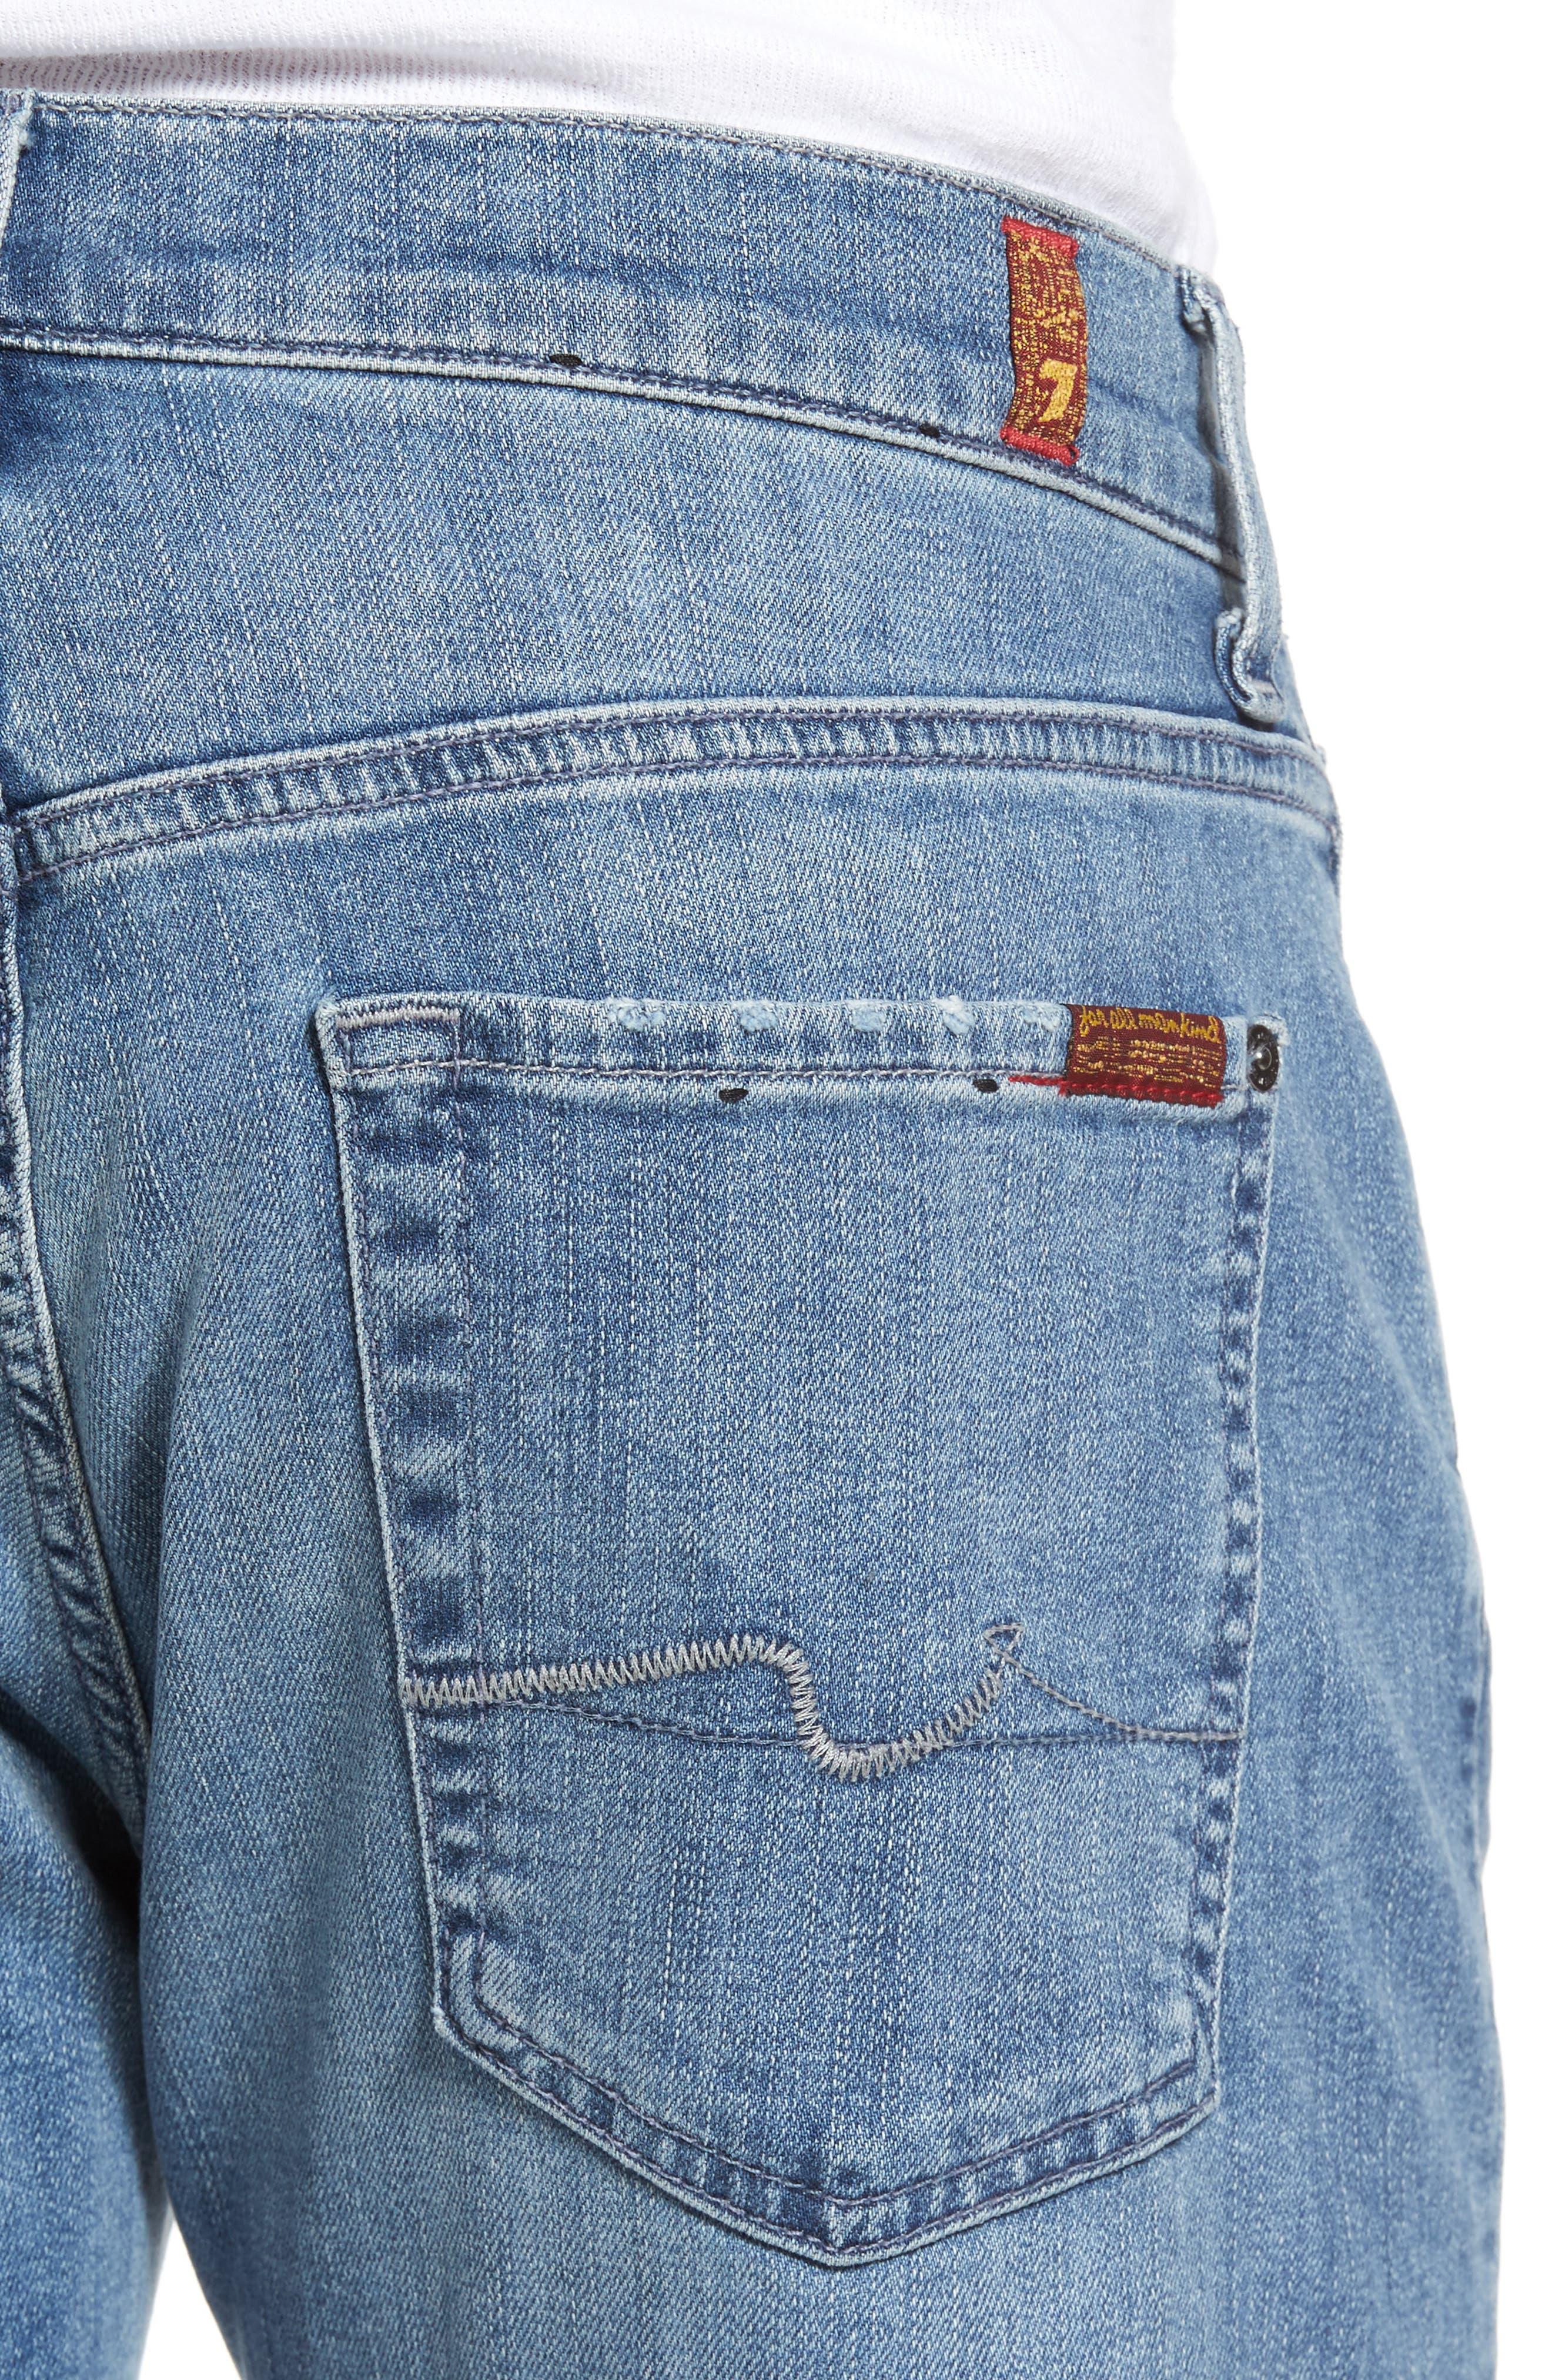 7 For All Mankind Slim Straight Leg Jeans,                             Alternate thumbnail 4, color,                             400